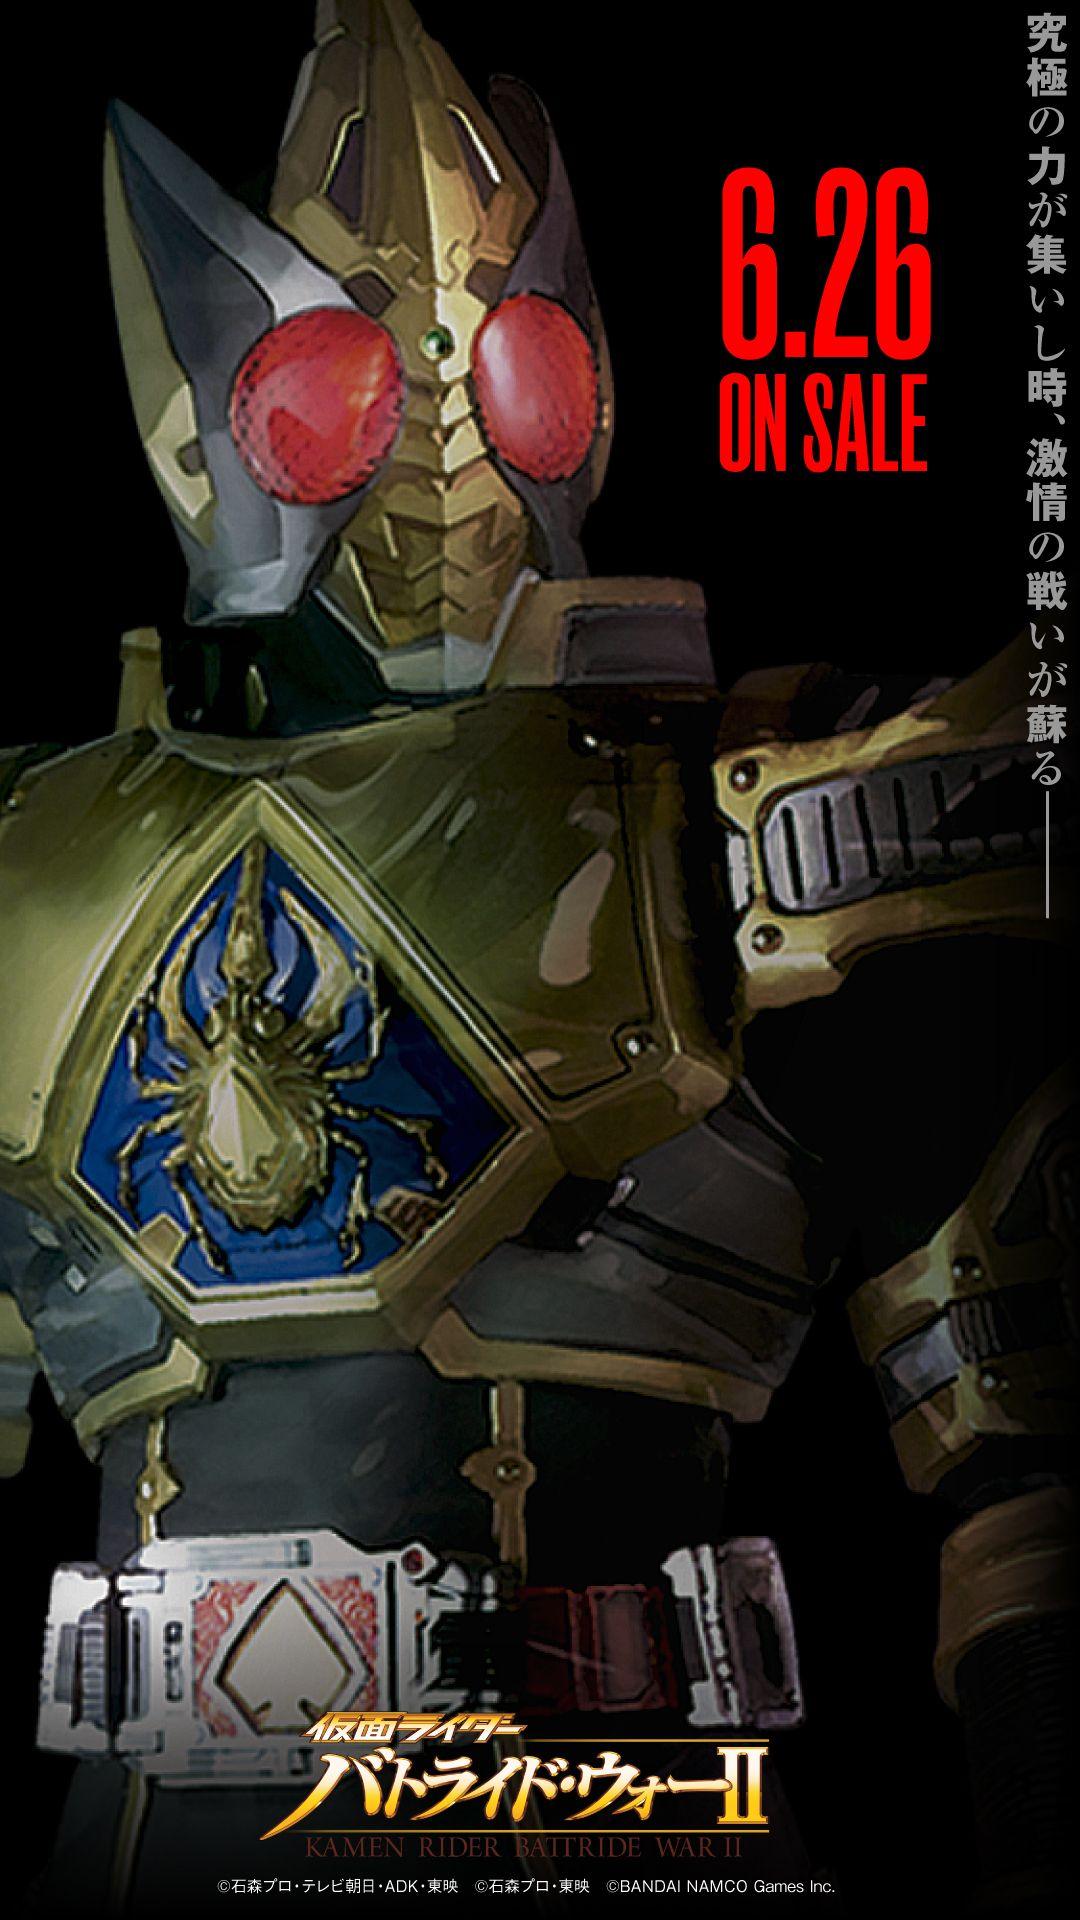 Masked Rider Blade King Form Kamenrider Maskedrider 仮面